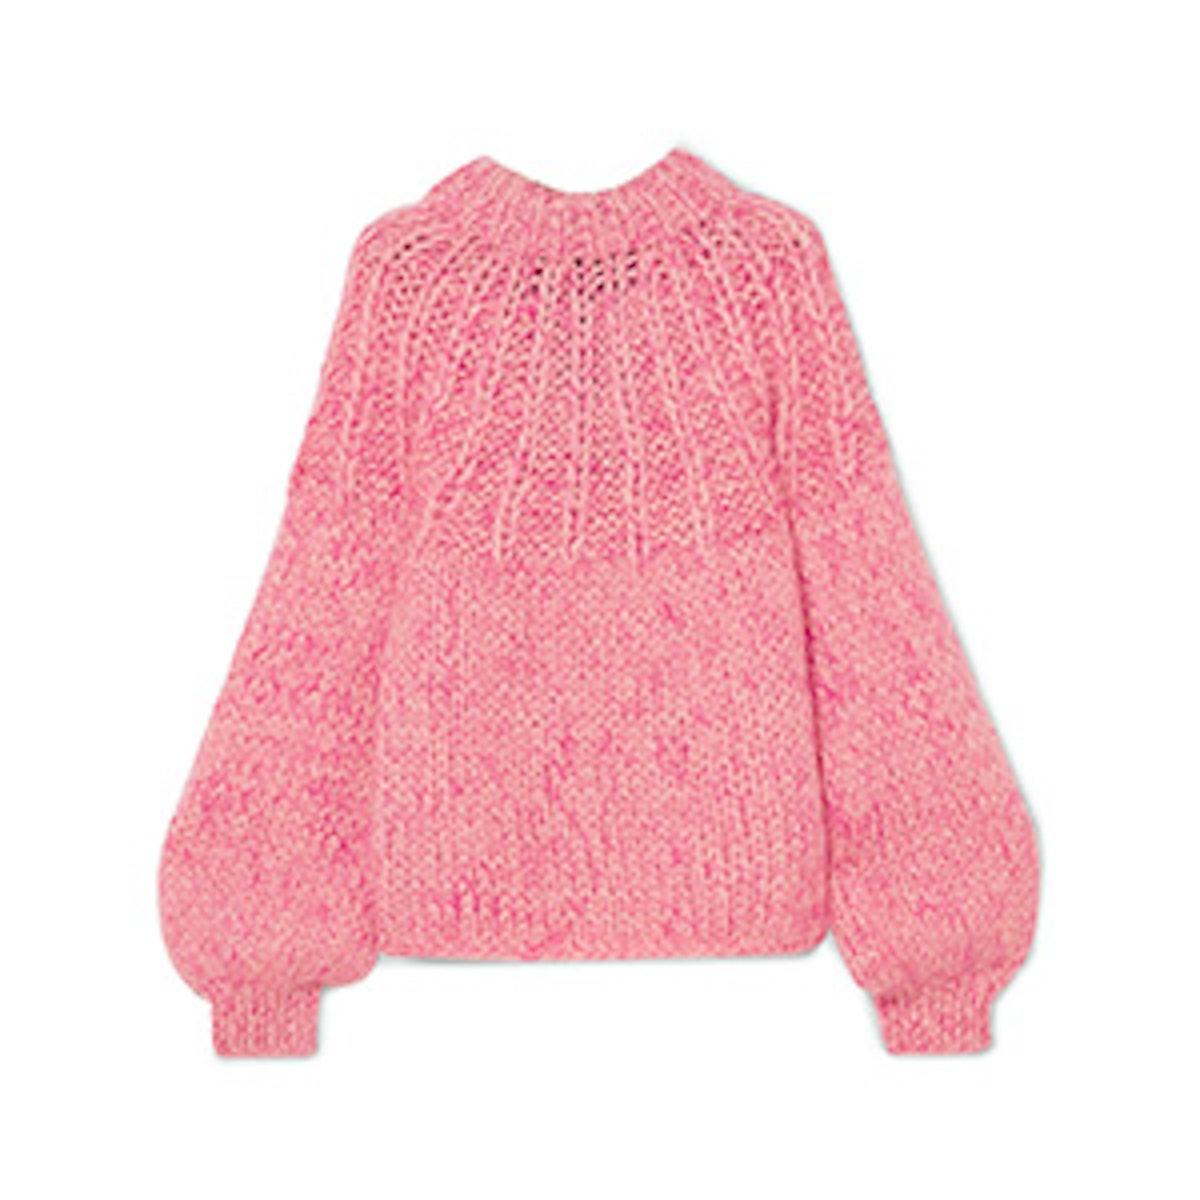 Julliard Mohair-Wool Sweater